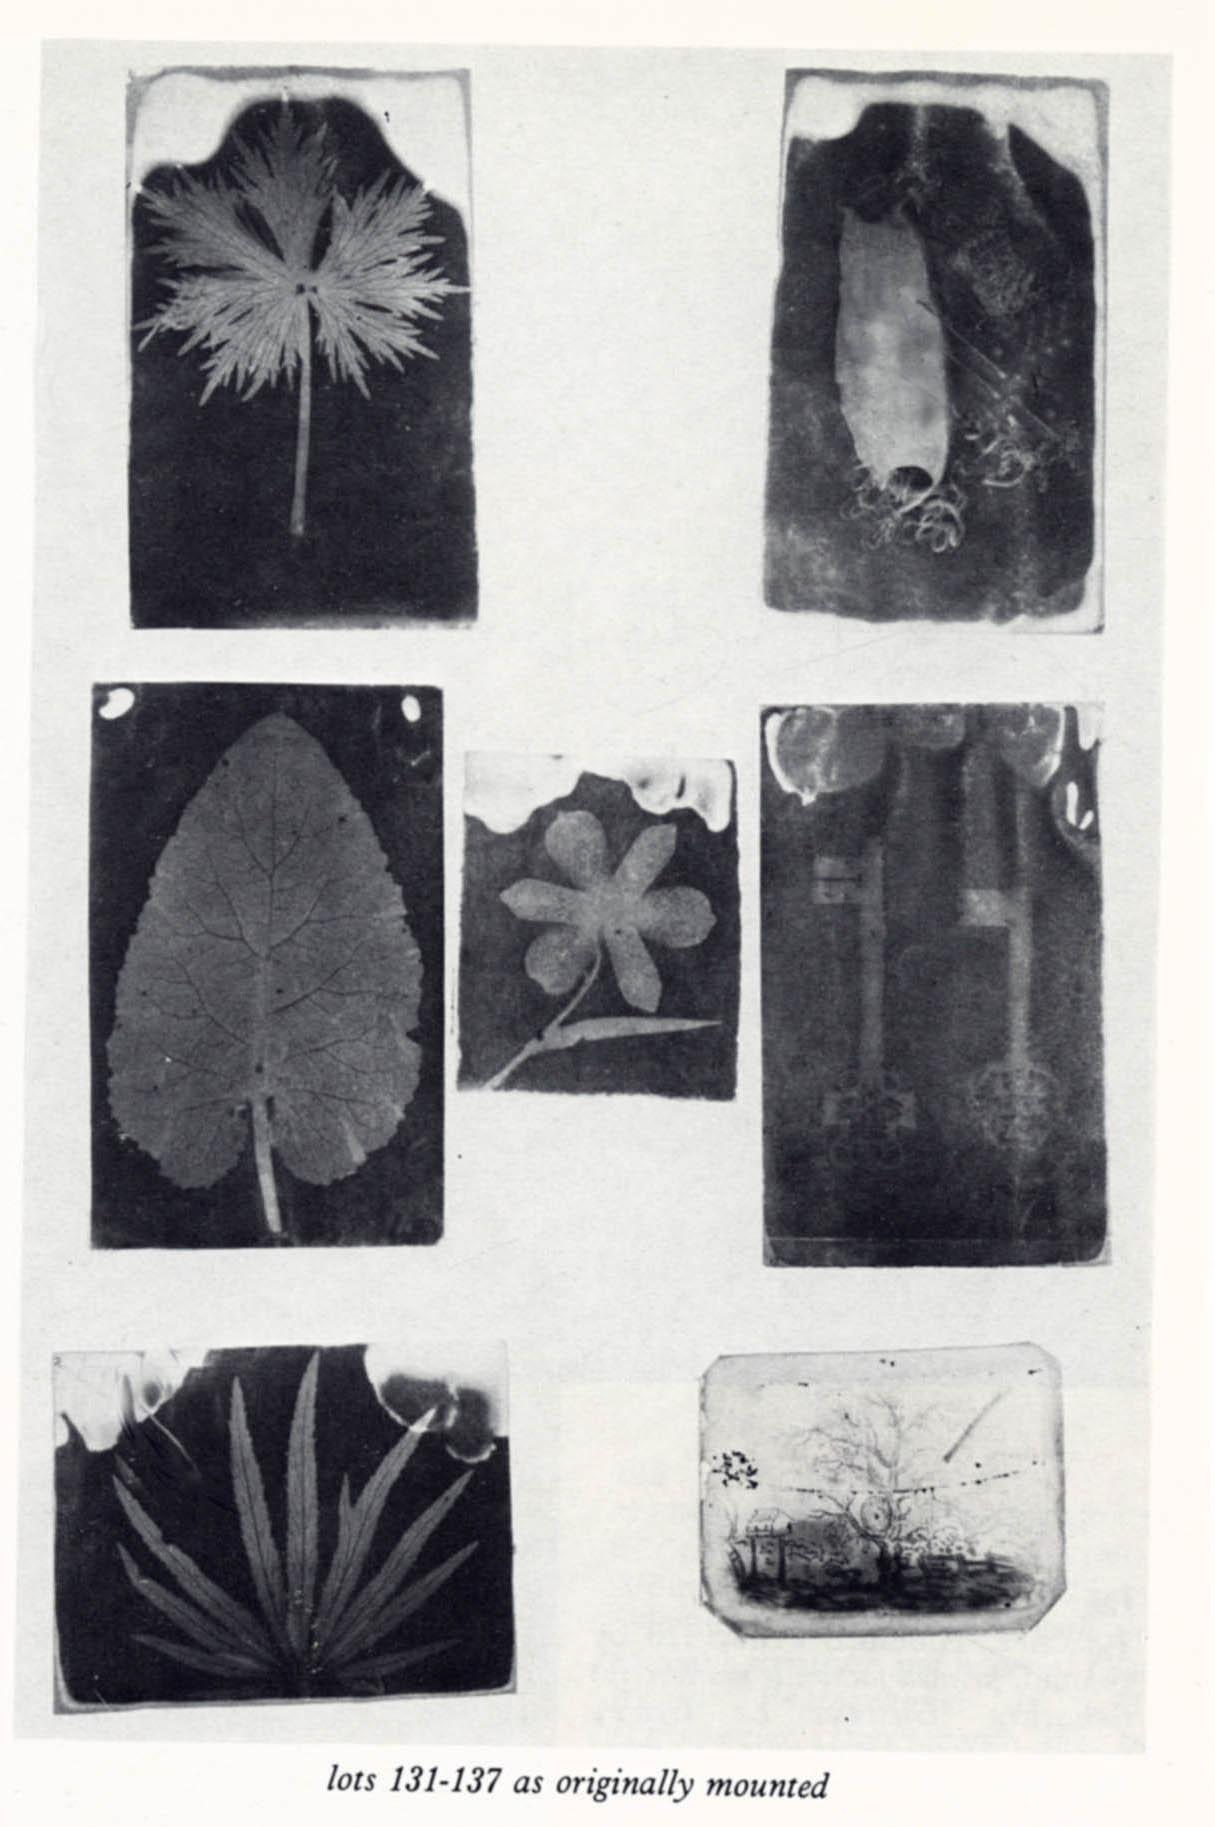 album-page-1984-de